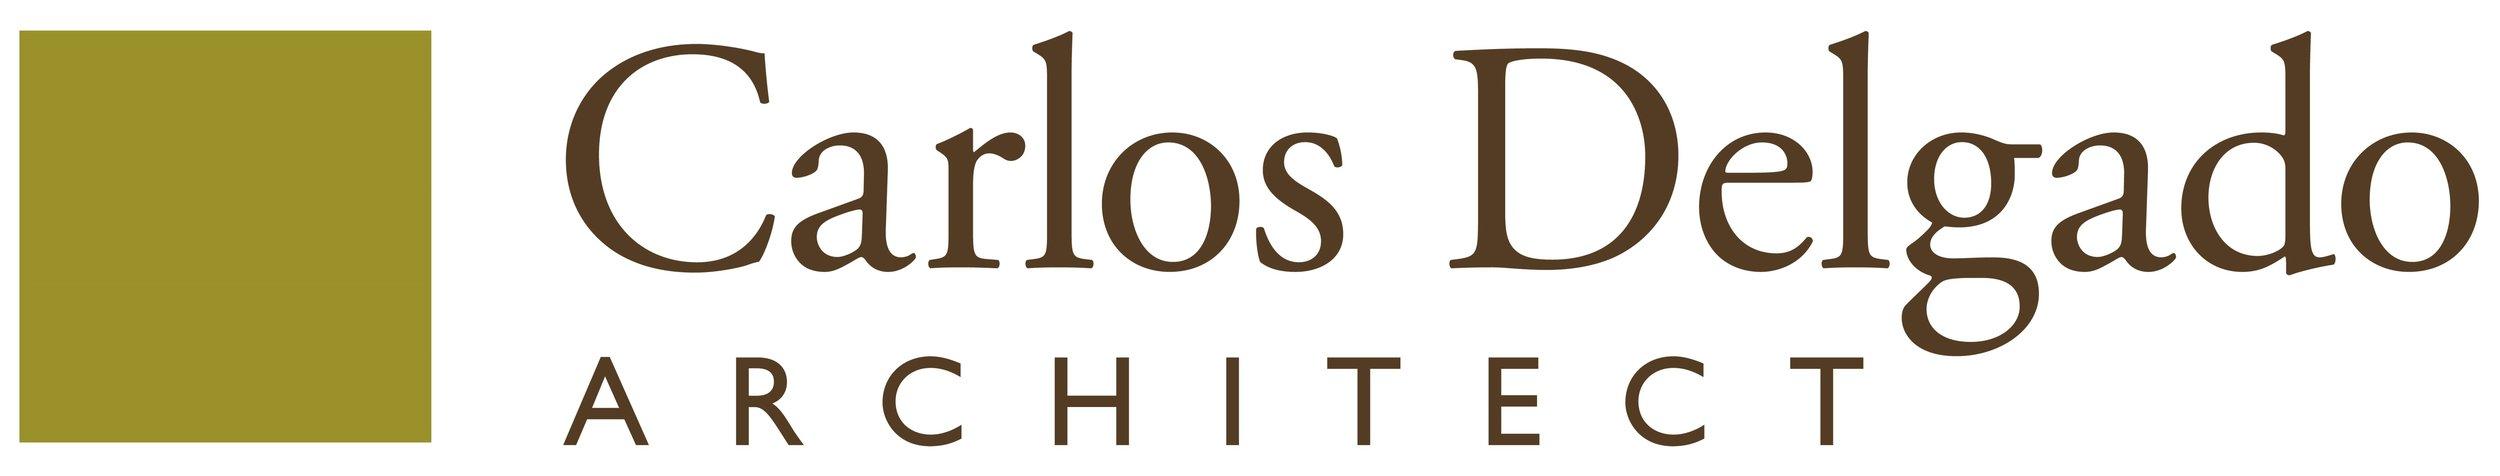 Delgado logo.jpg